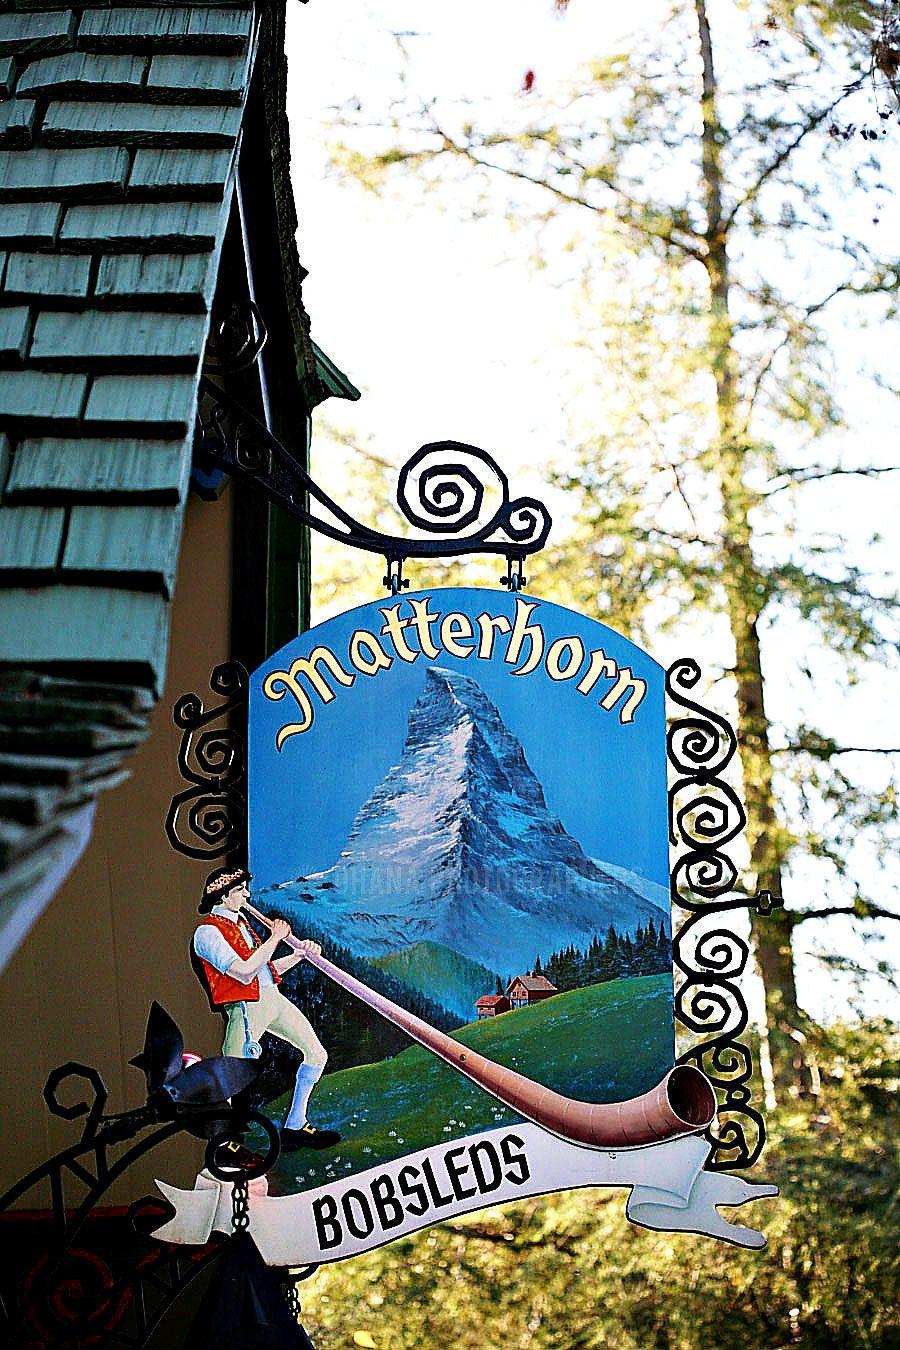 Disneyland Matterhorn Bobsleds Fantasyland O Disney